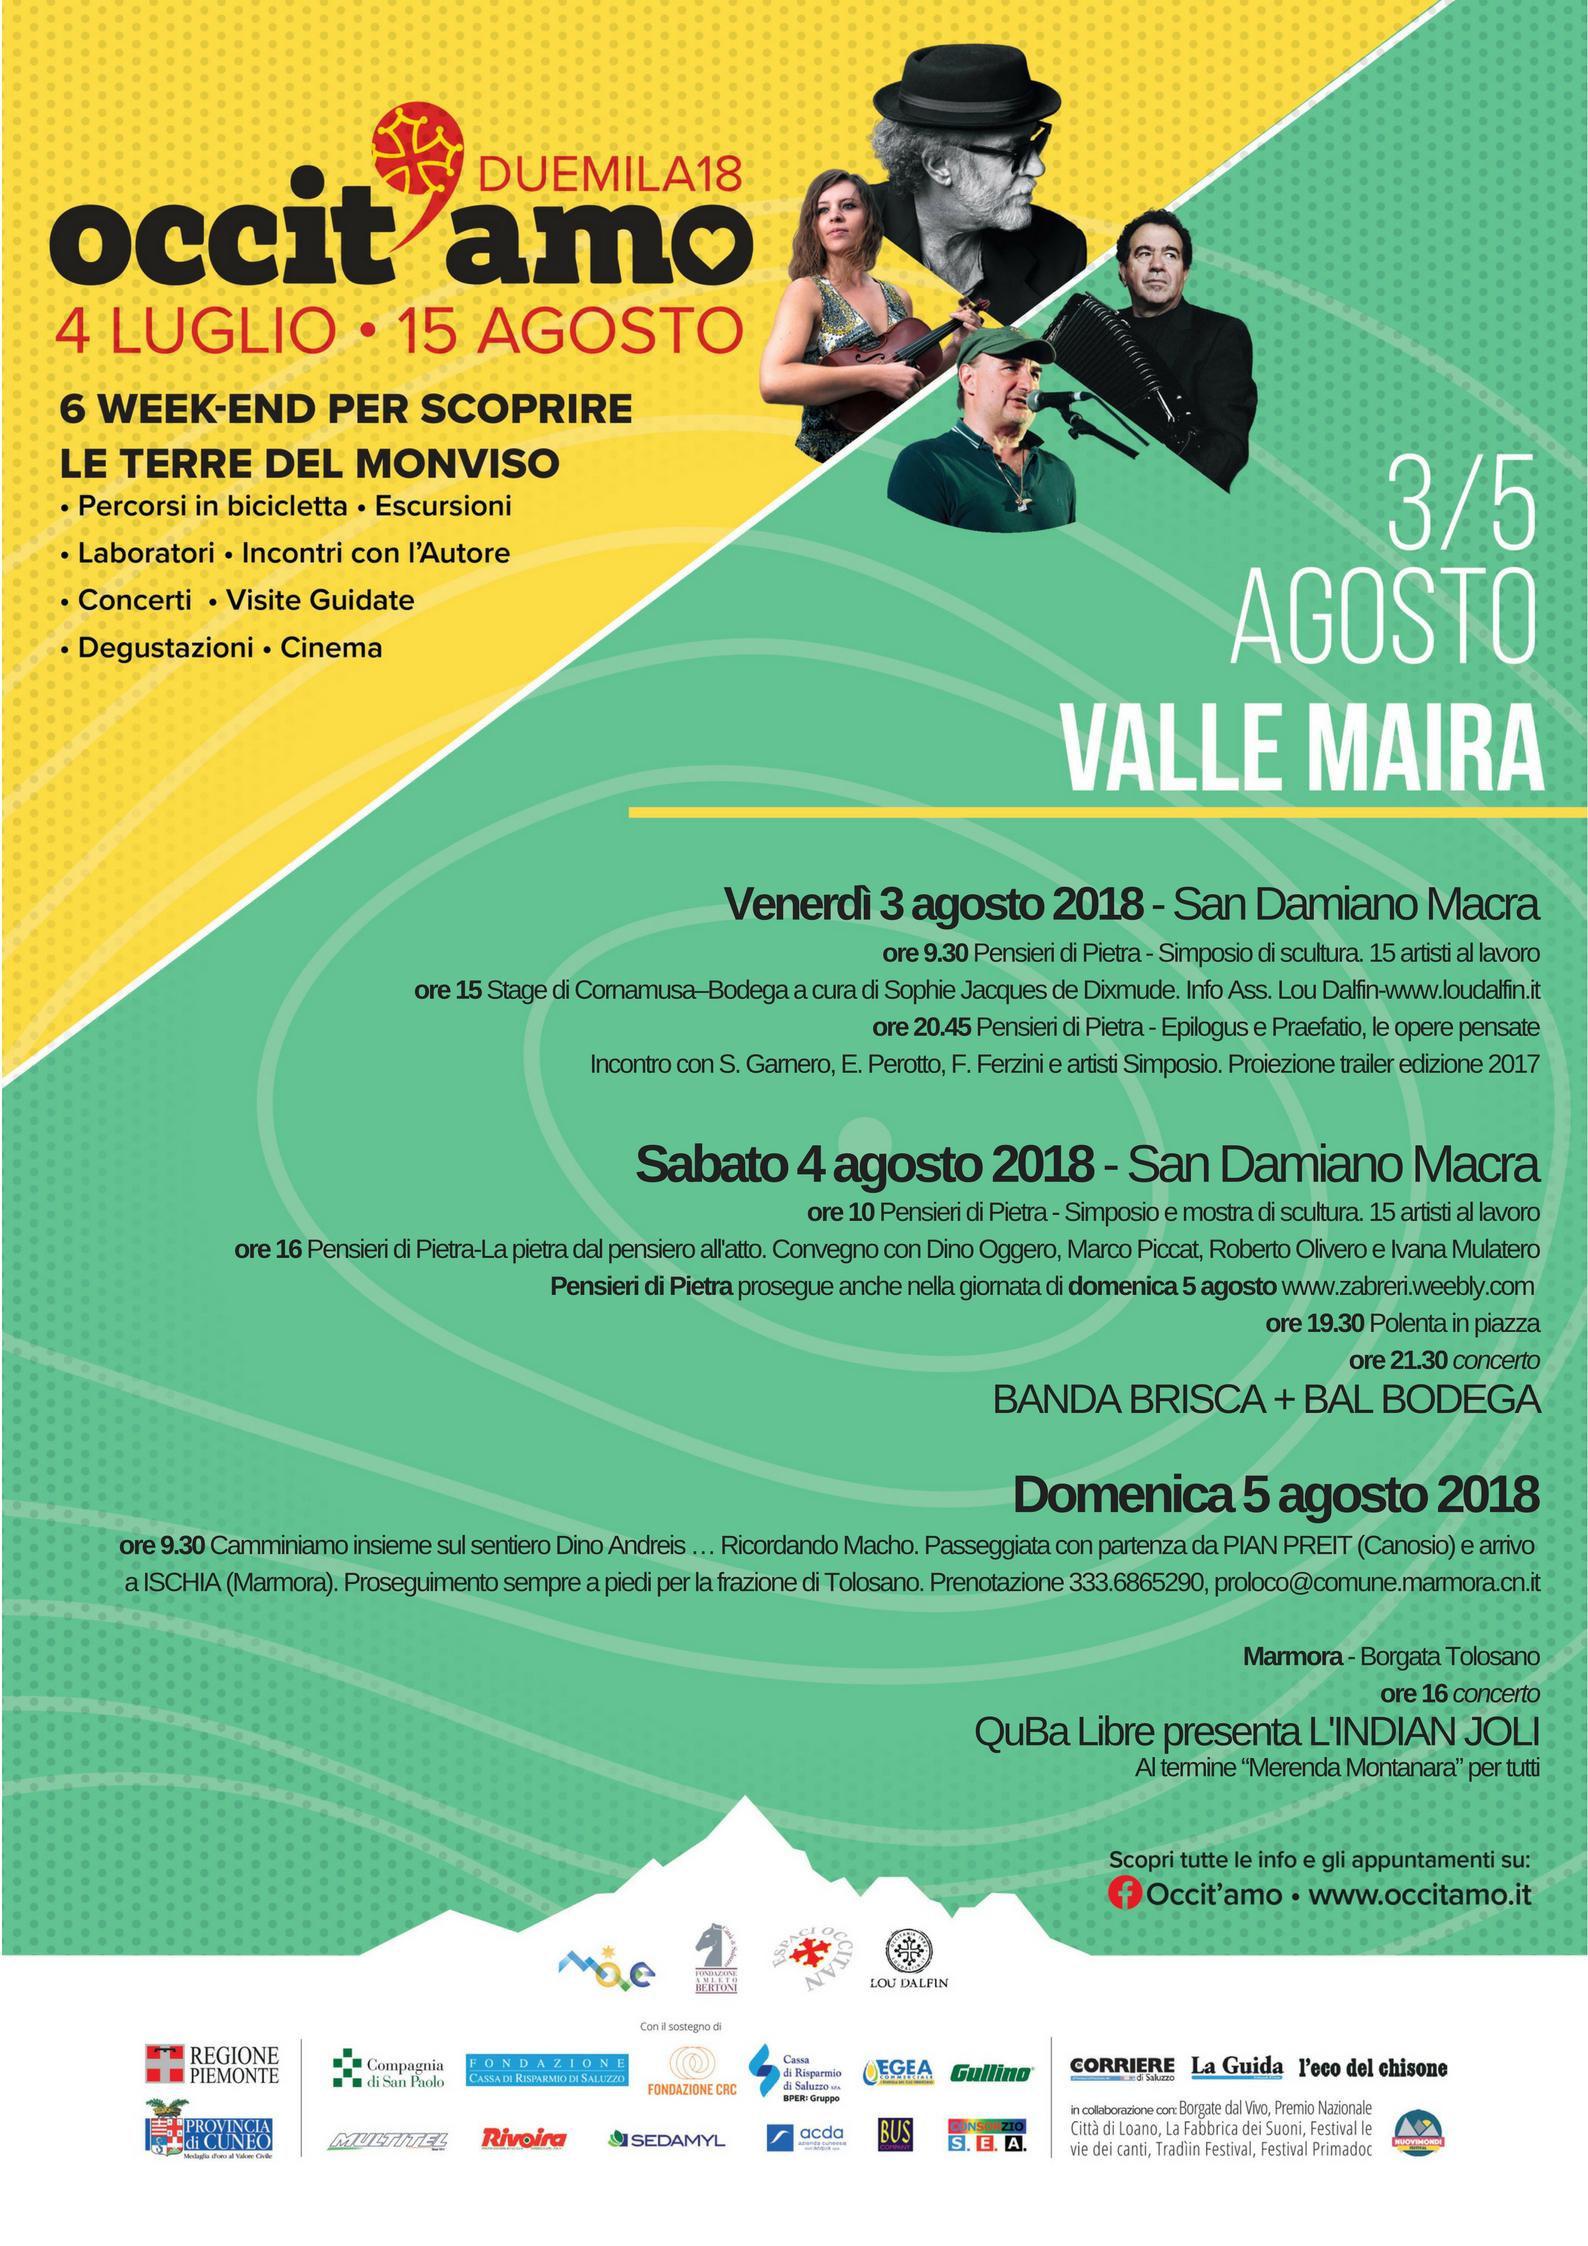 locandina occit amo completa_VALLE MAIRA